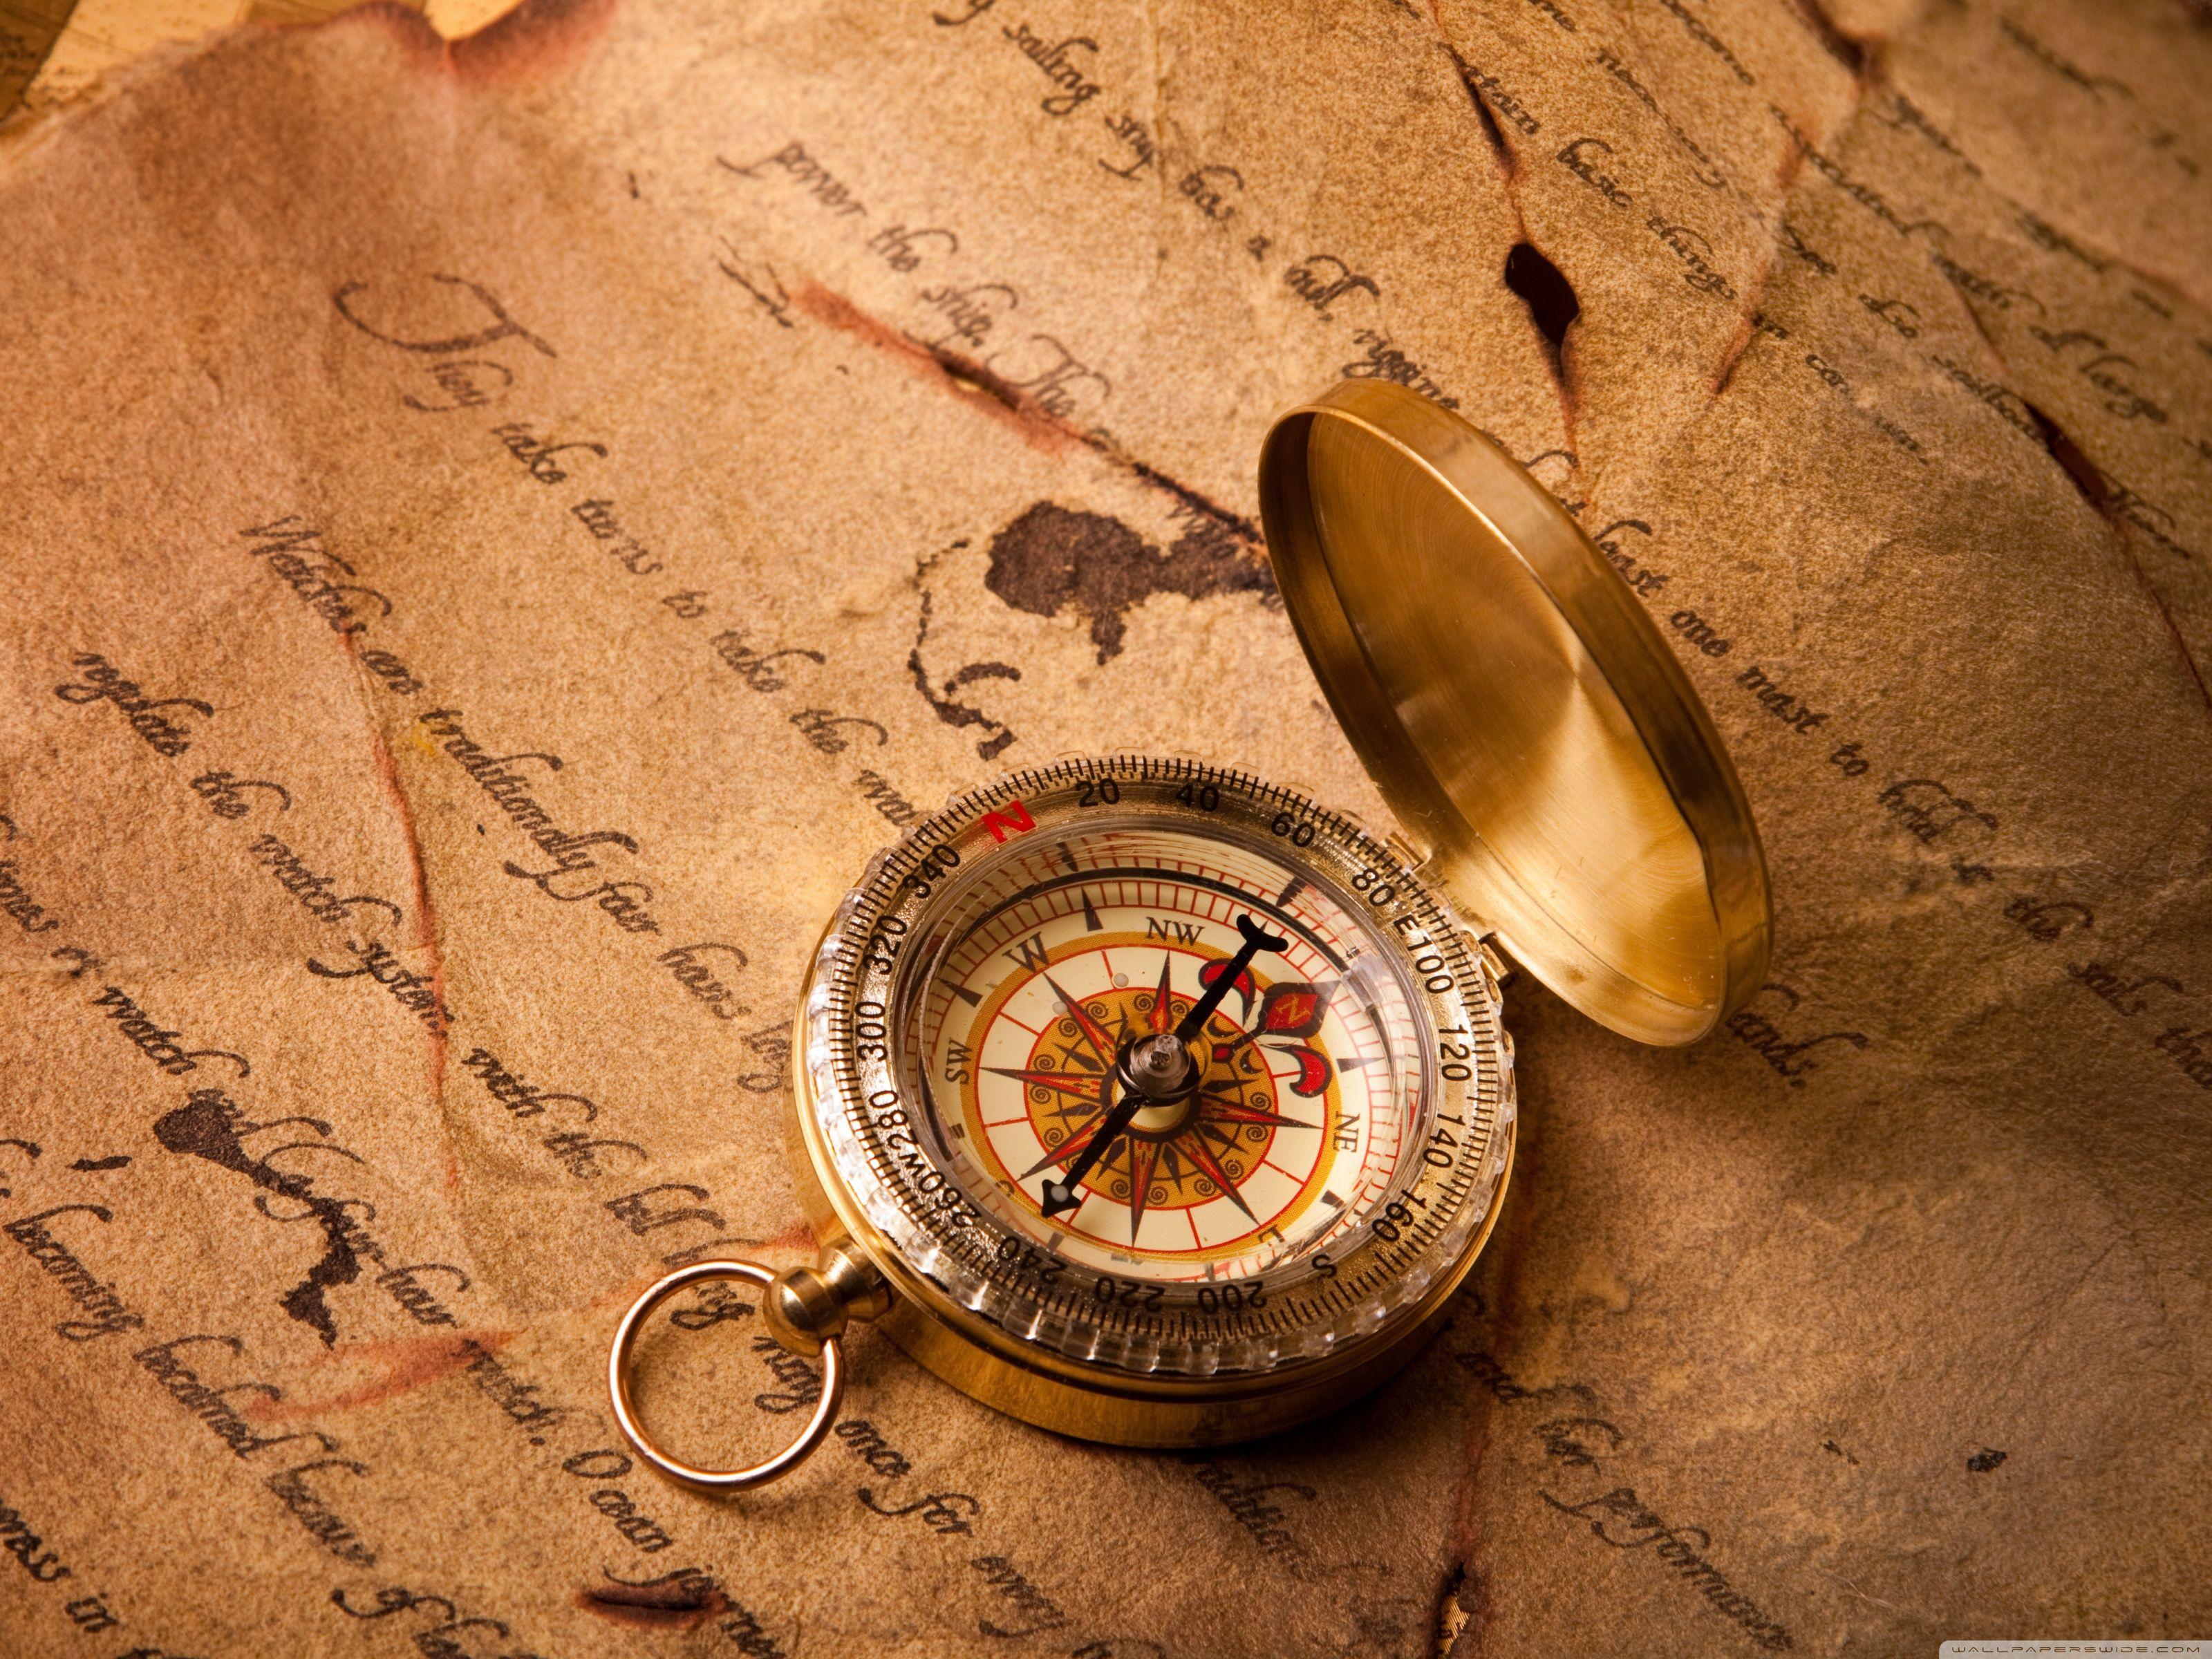 Compass Wallpapers   Top Compass Backgrounds   WallpaperAccess 3200x2400